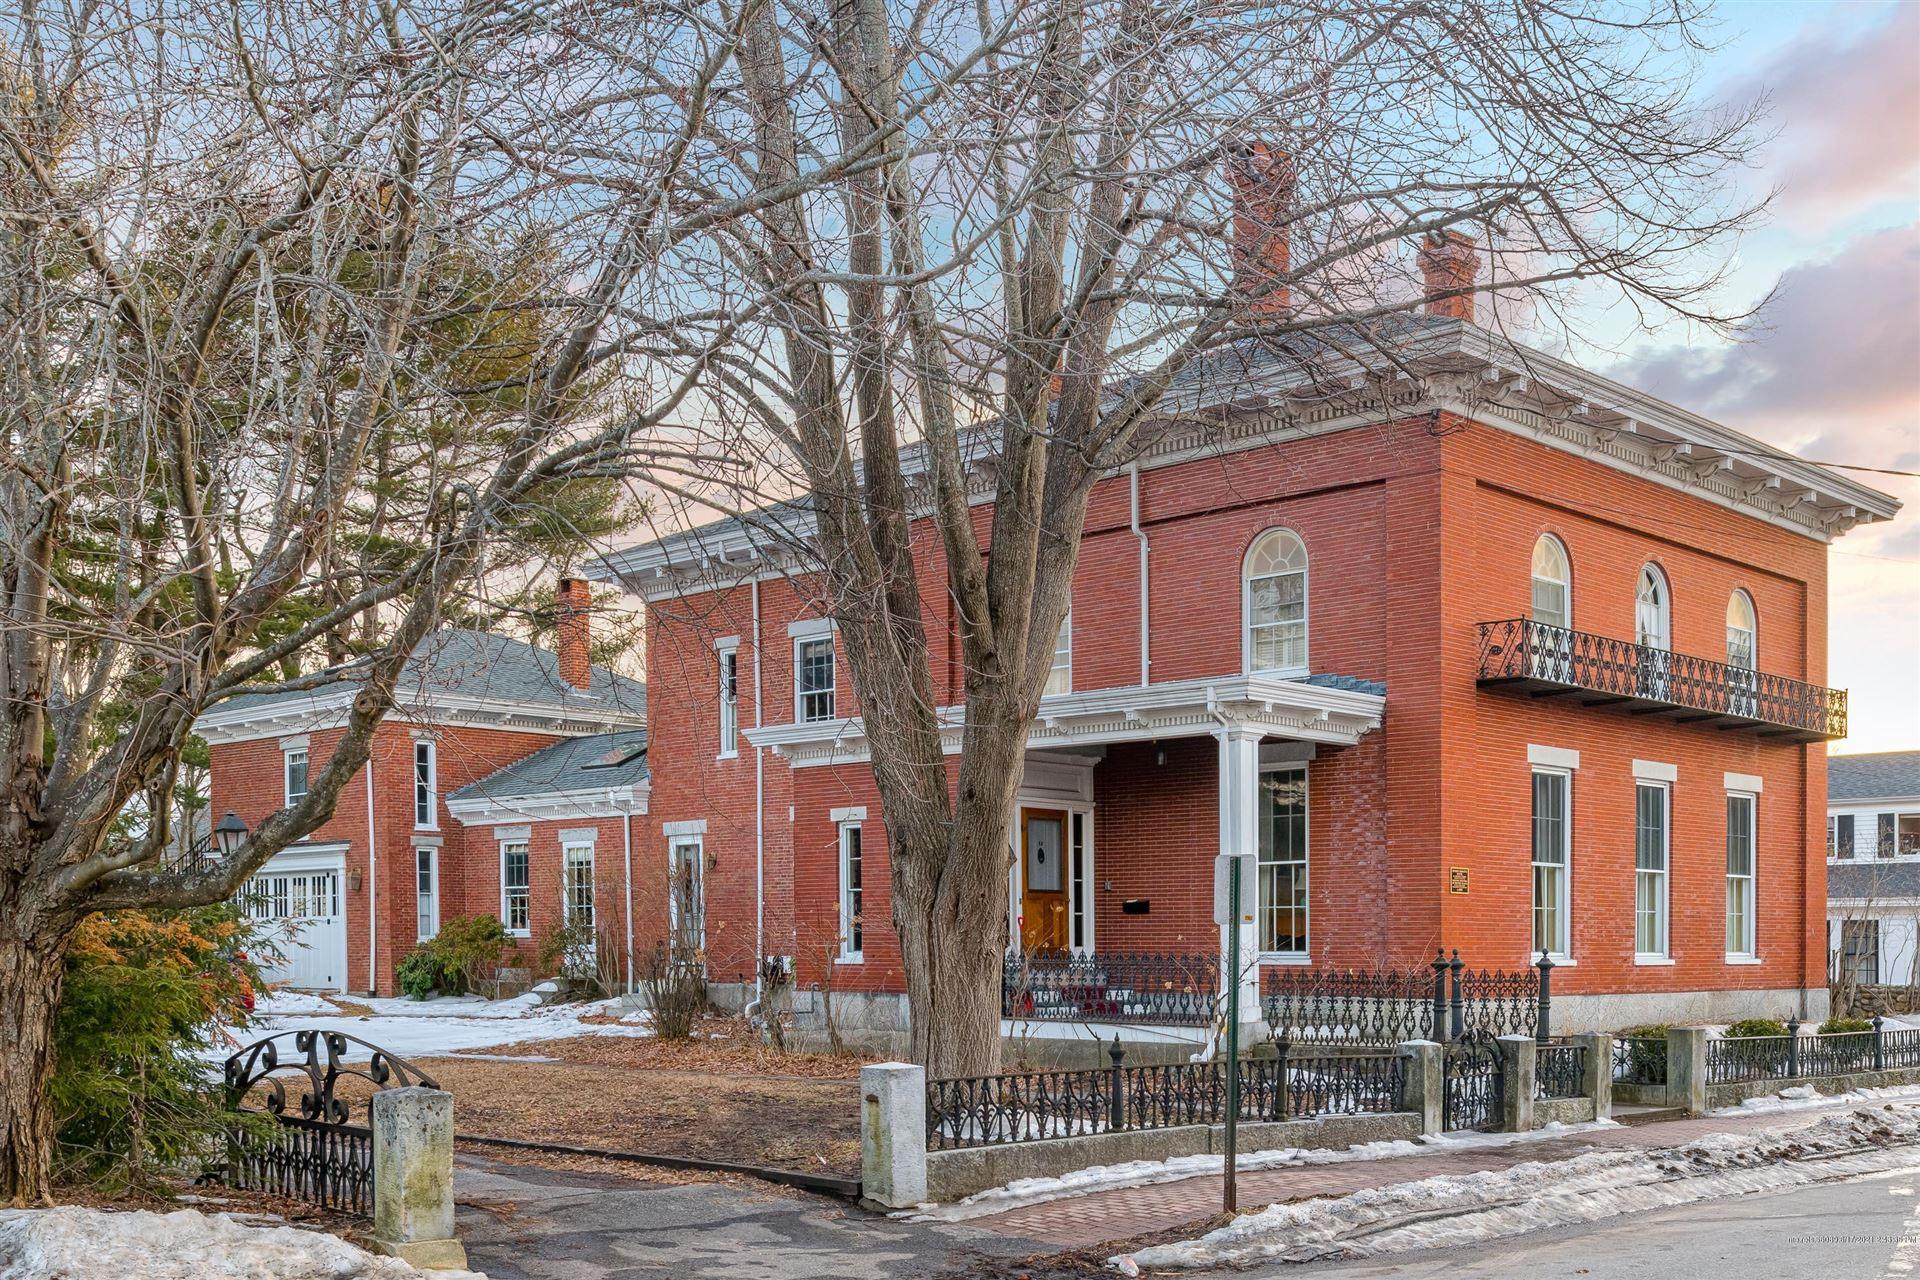 Photo of 11 Lincoln Street, Brunswick, ME 04011 (MLS # 1495957)